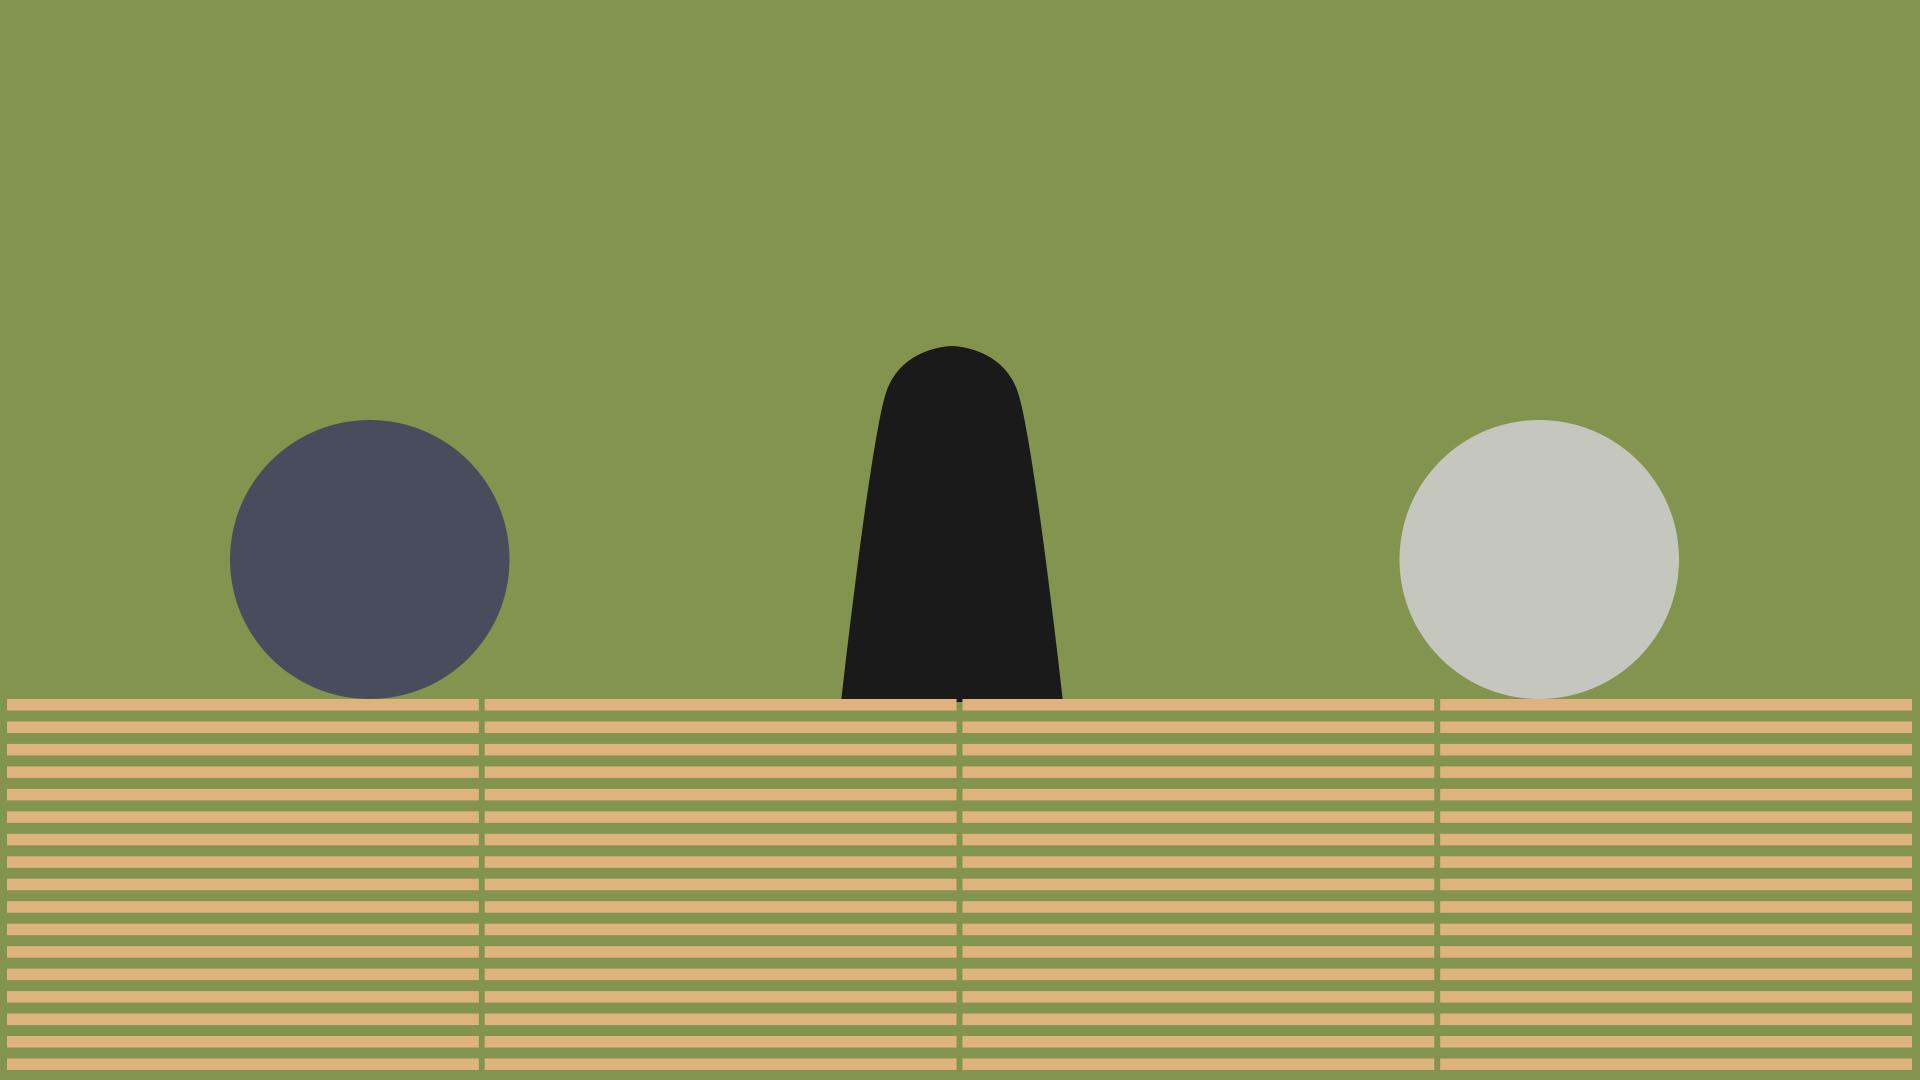 animatique maison corbeille v3_0032_37.jpg